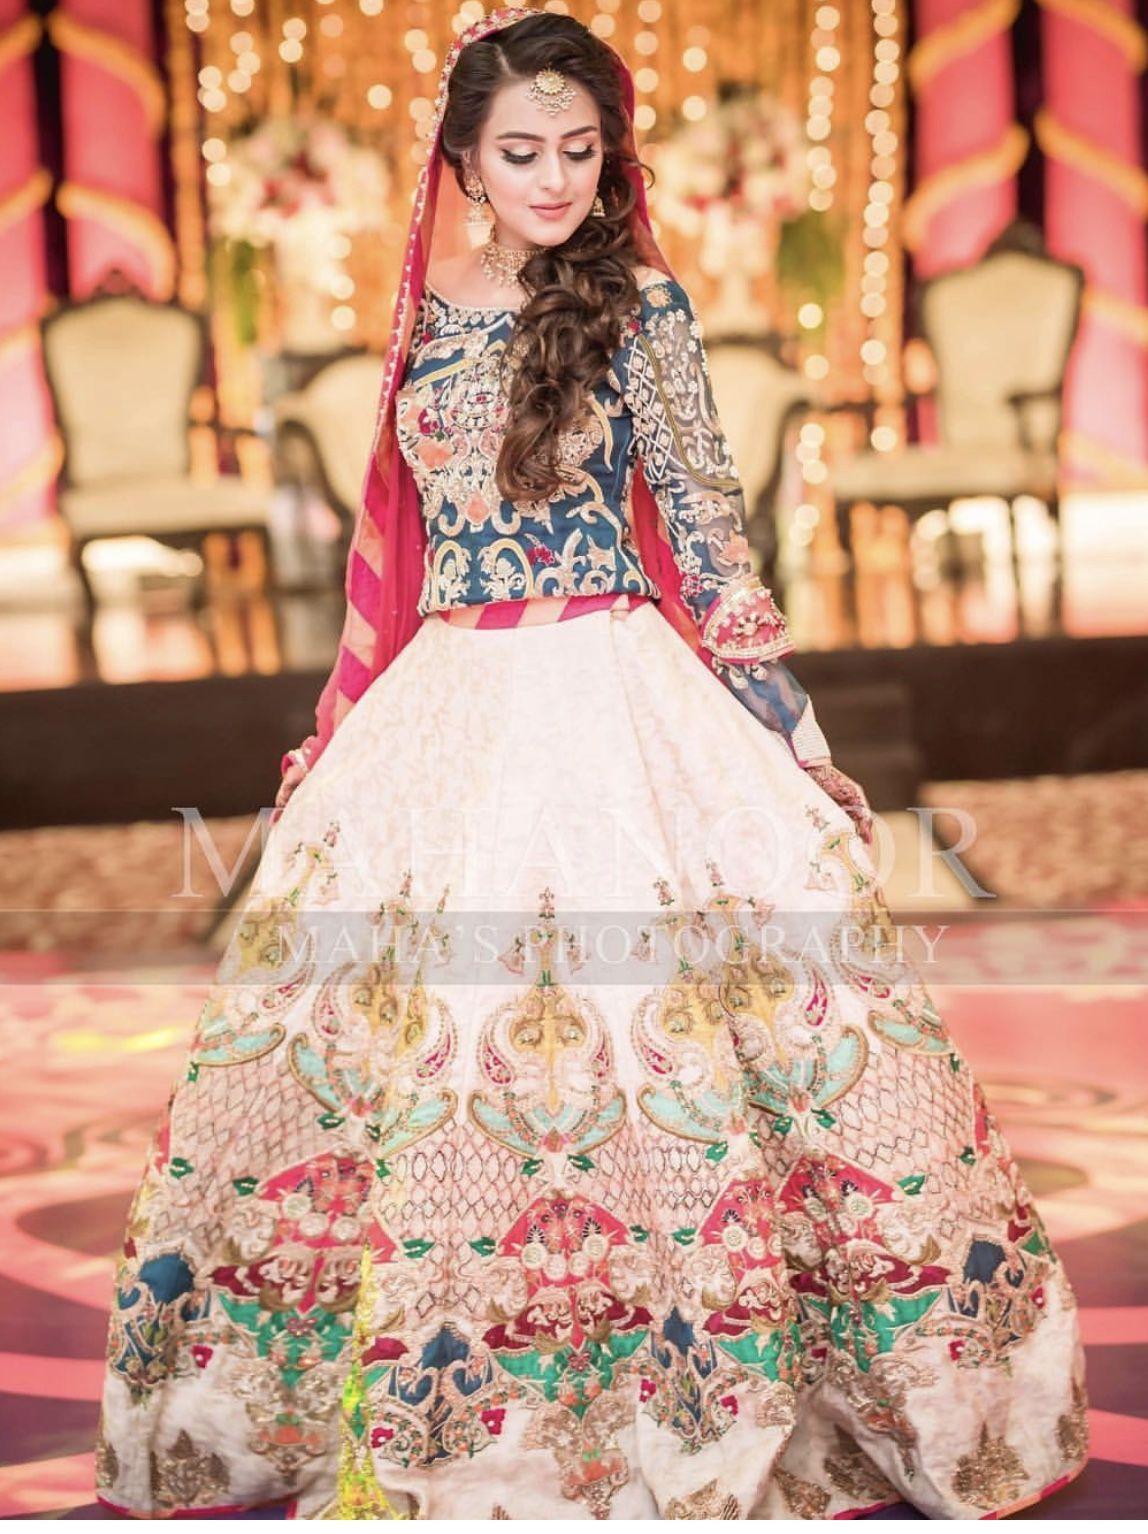 Beautiful Mehndi Dress Pic Pakistani | Lixnet AG